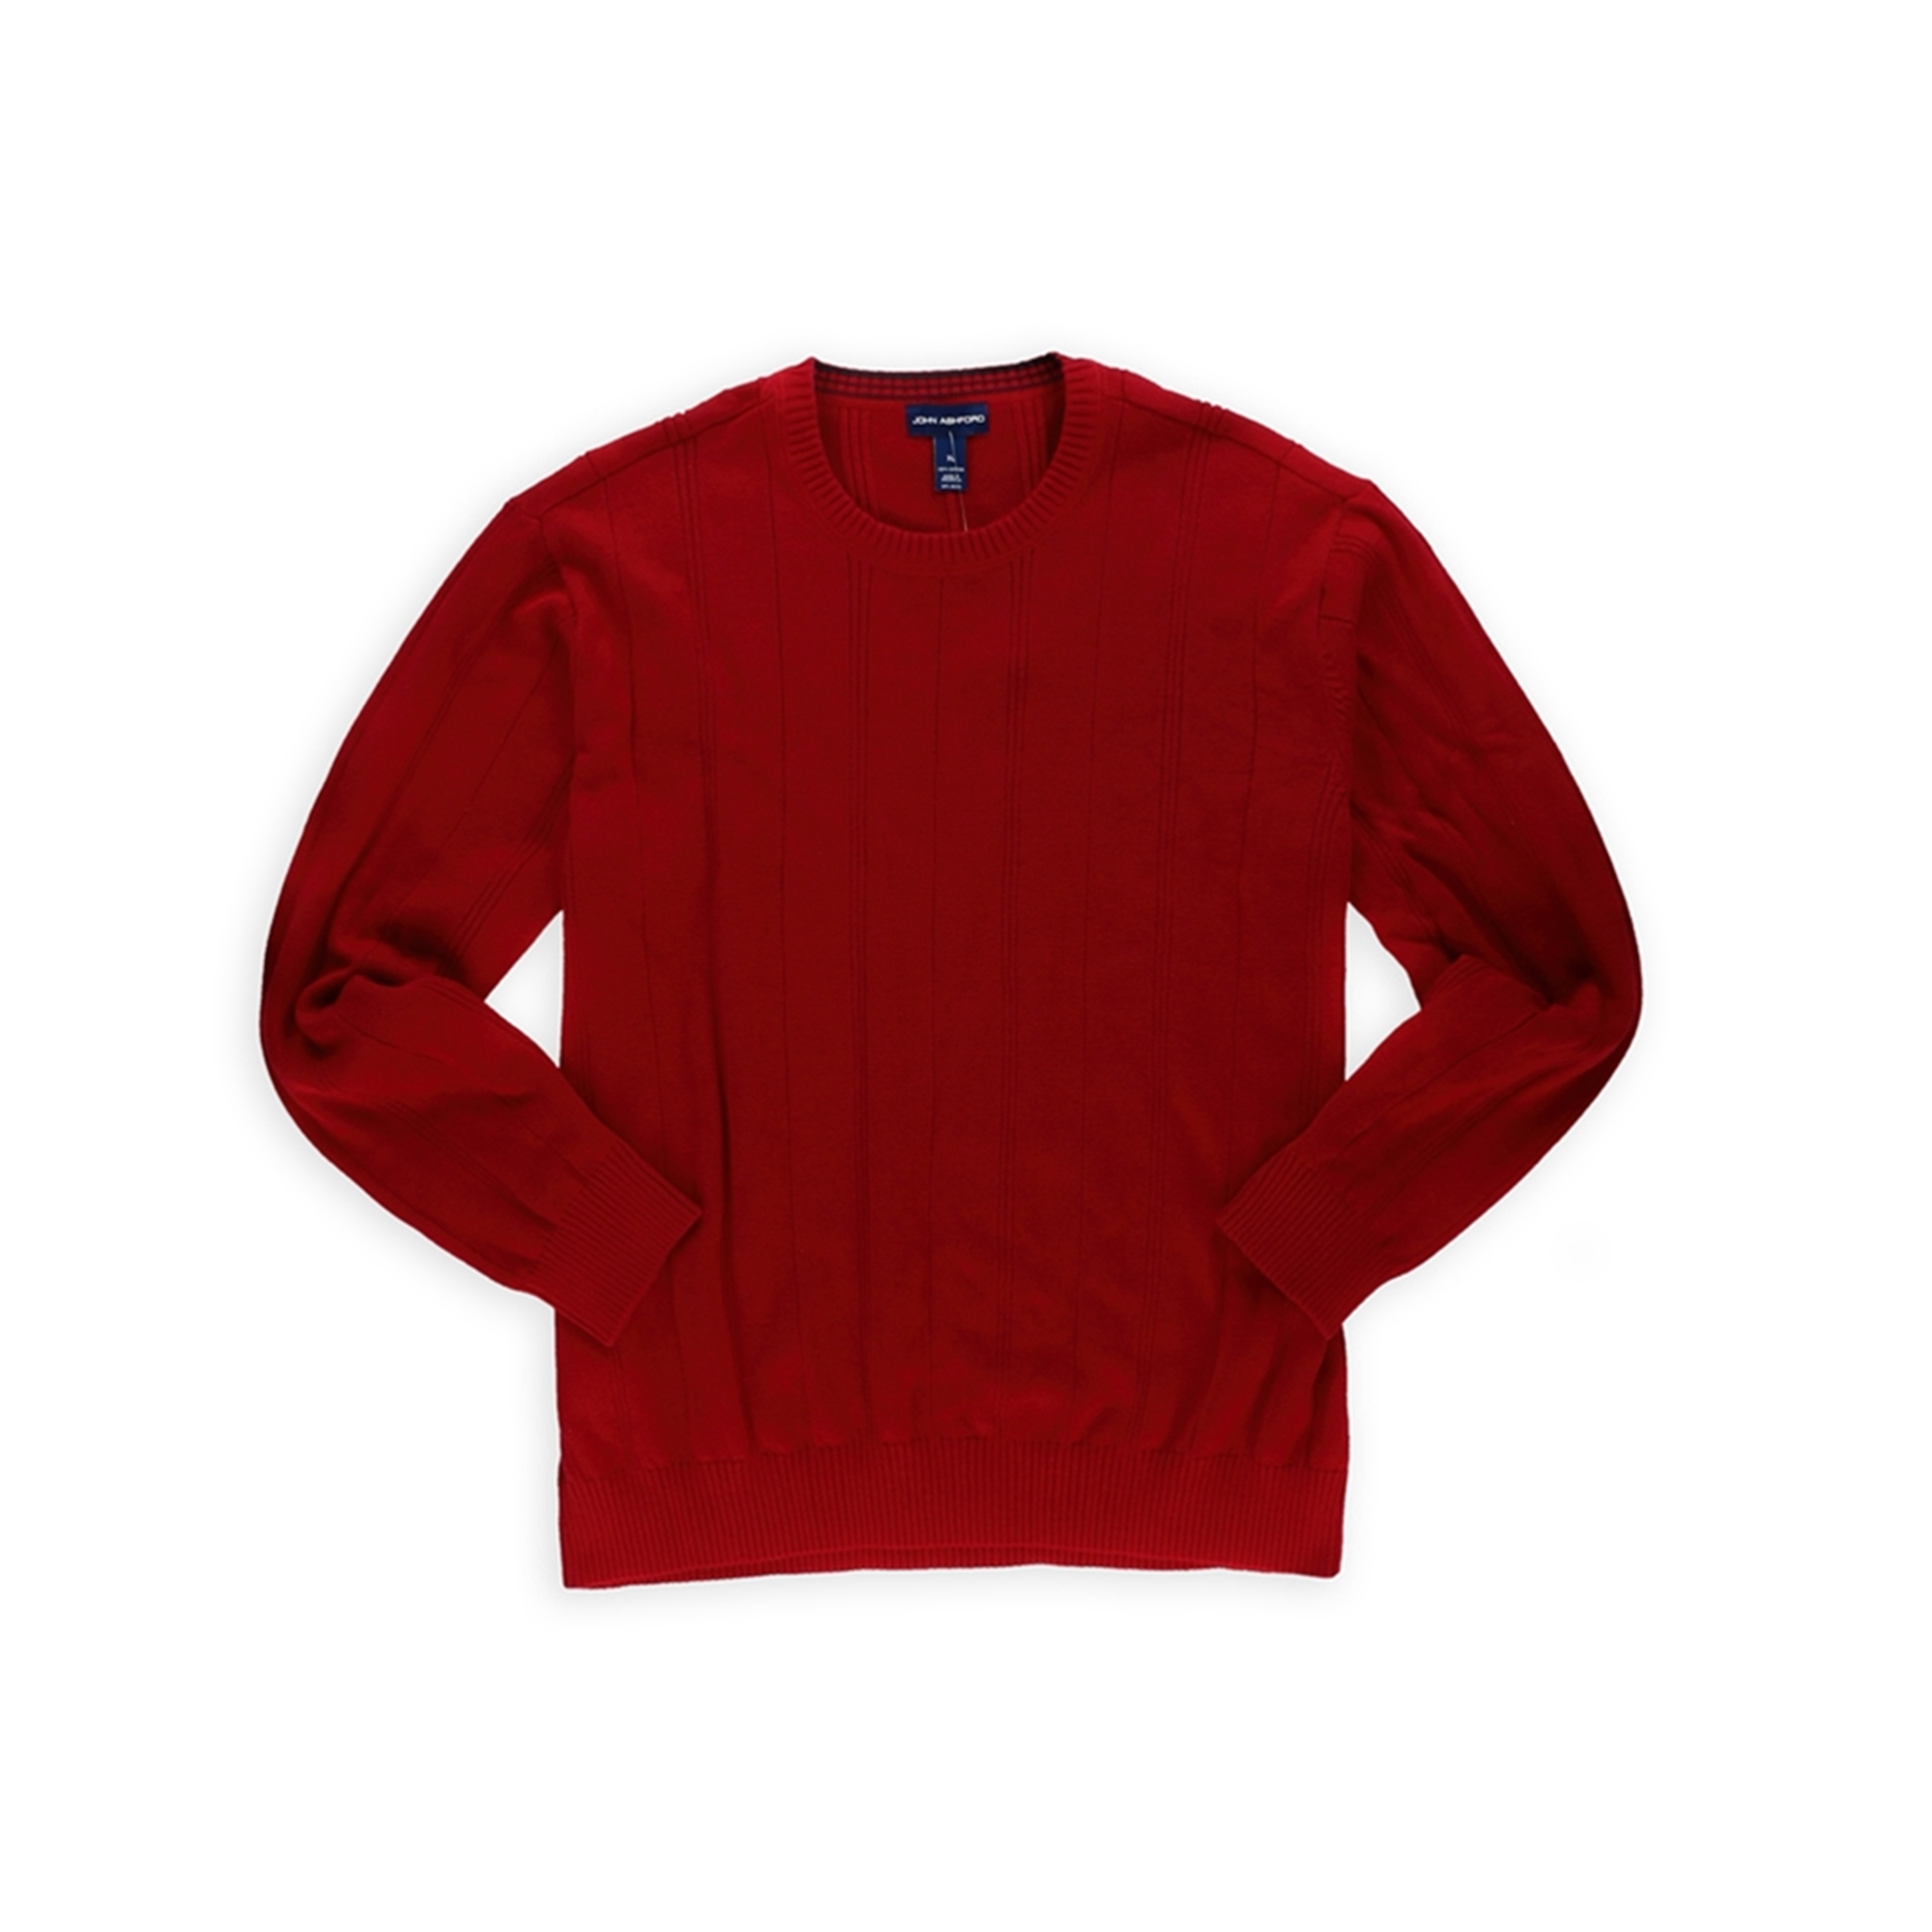 John Ashford Mens Ribbed Knit Pullover Sweater